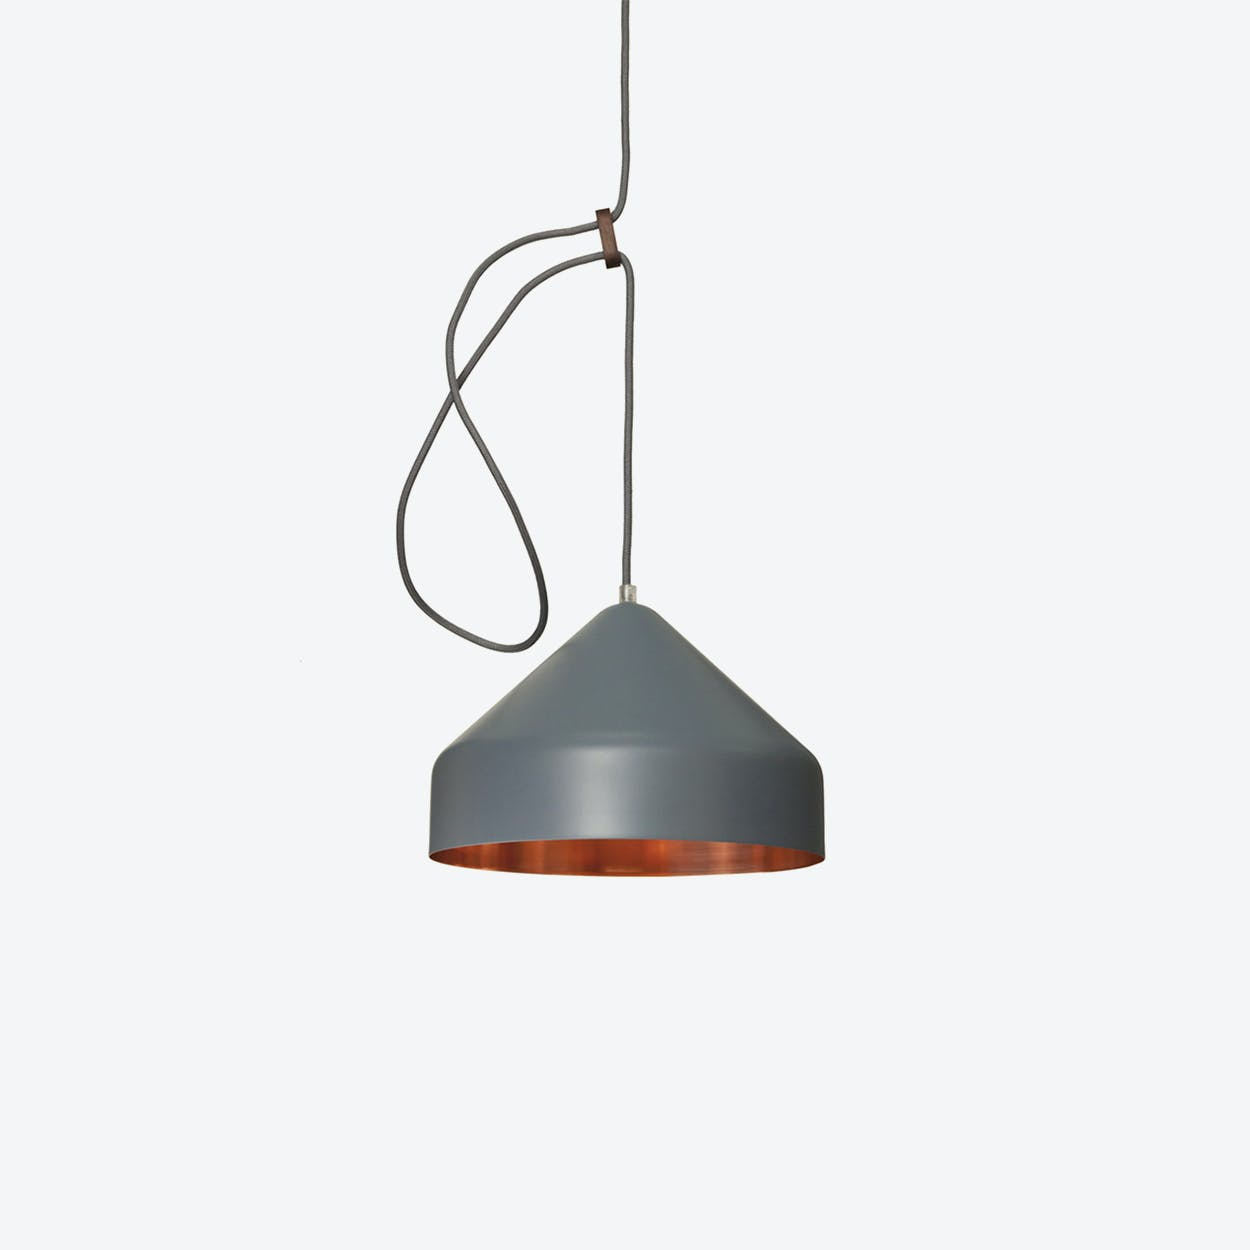 Lloop Pendant Lamp in Copper & Grey